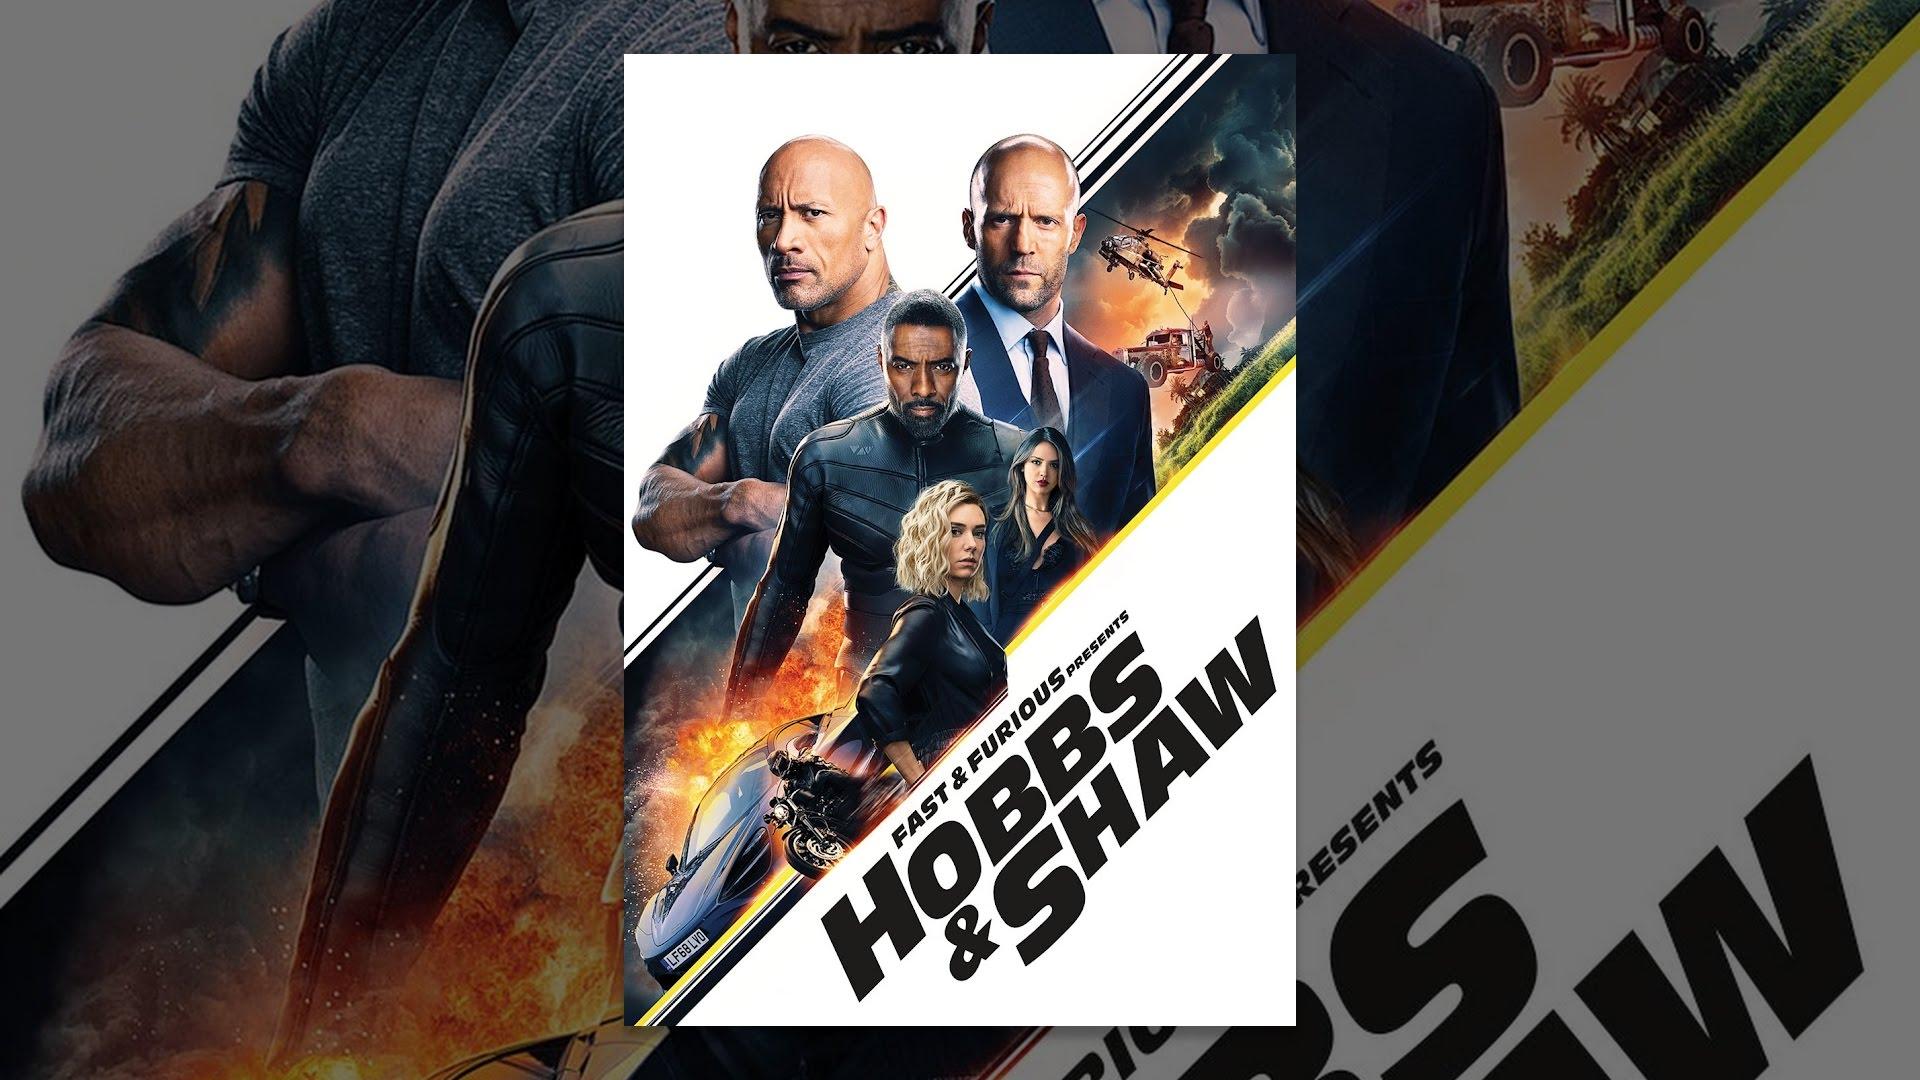 [VIDEO] - Fast & Furious Presents: Hobbs & Shaw 1